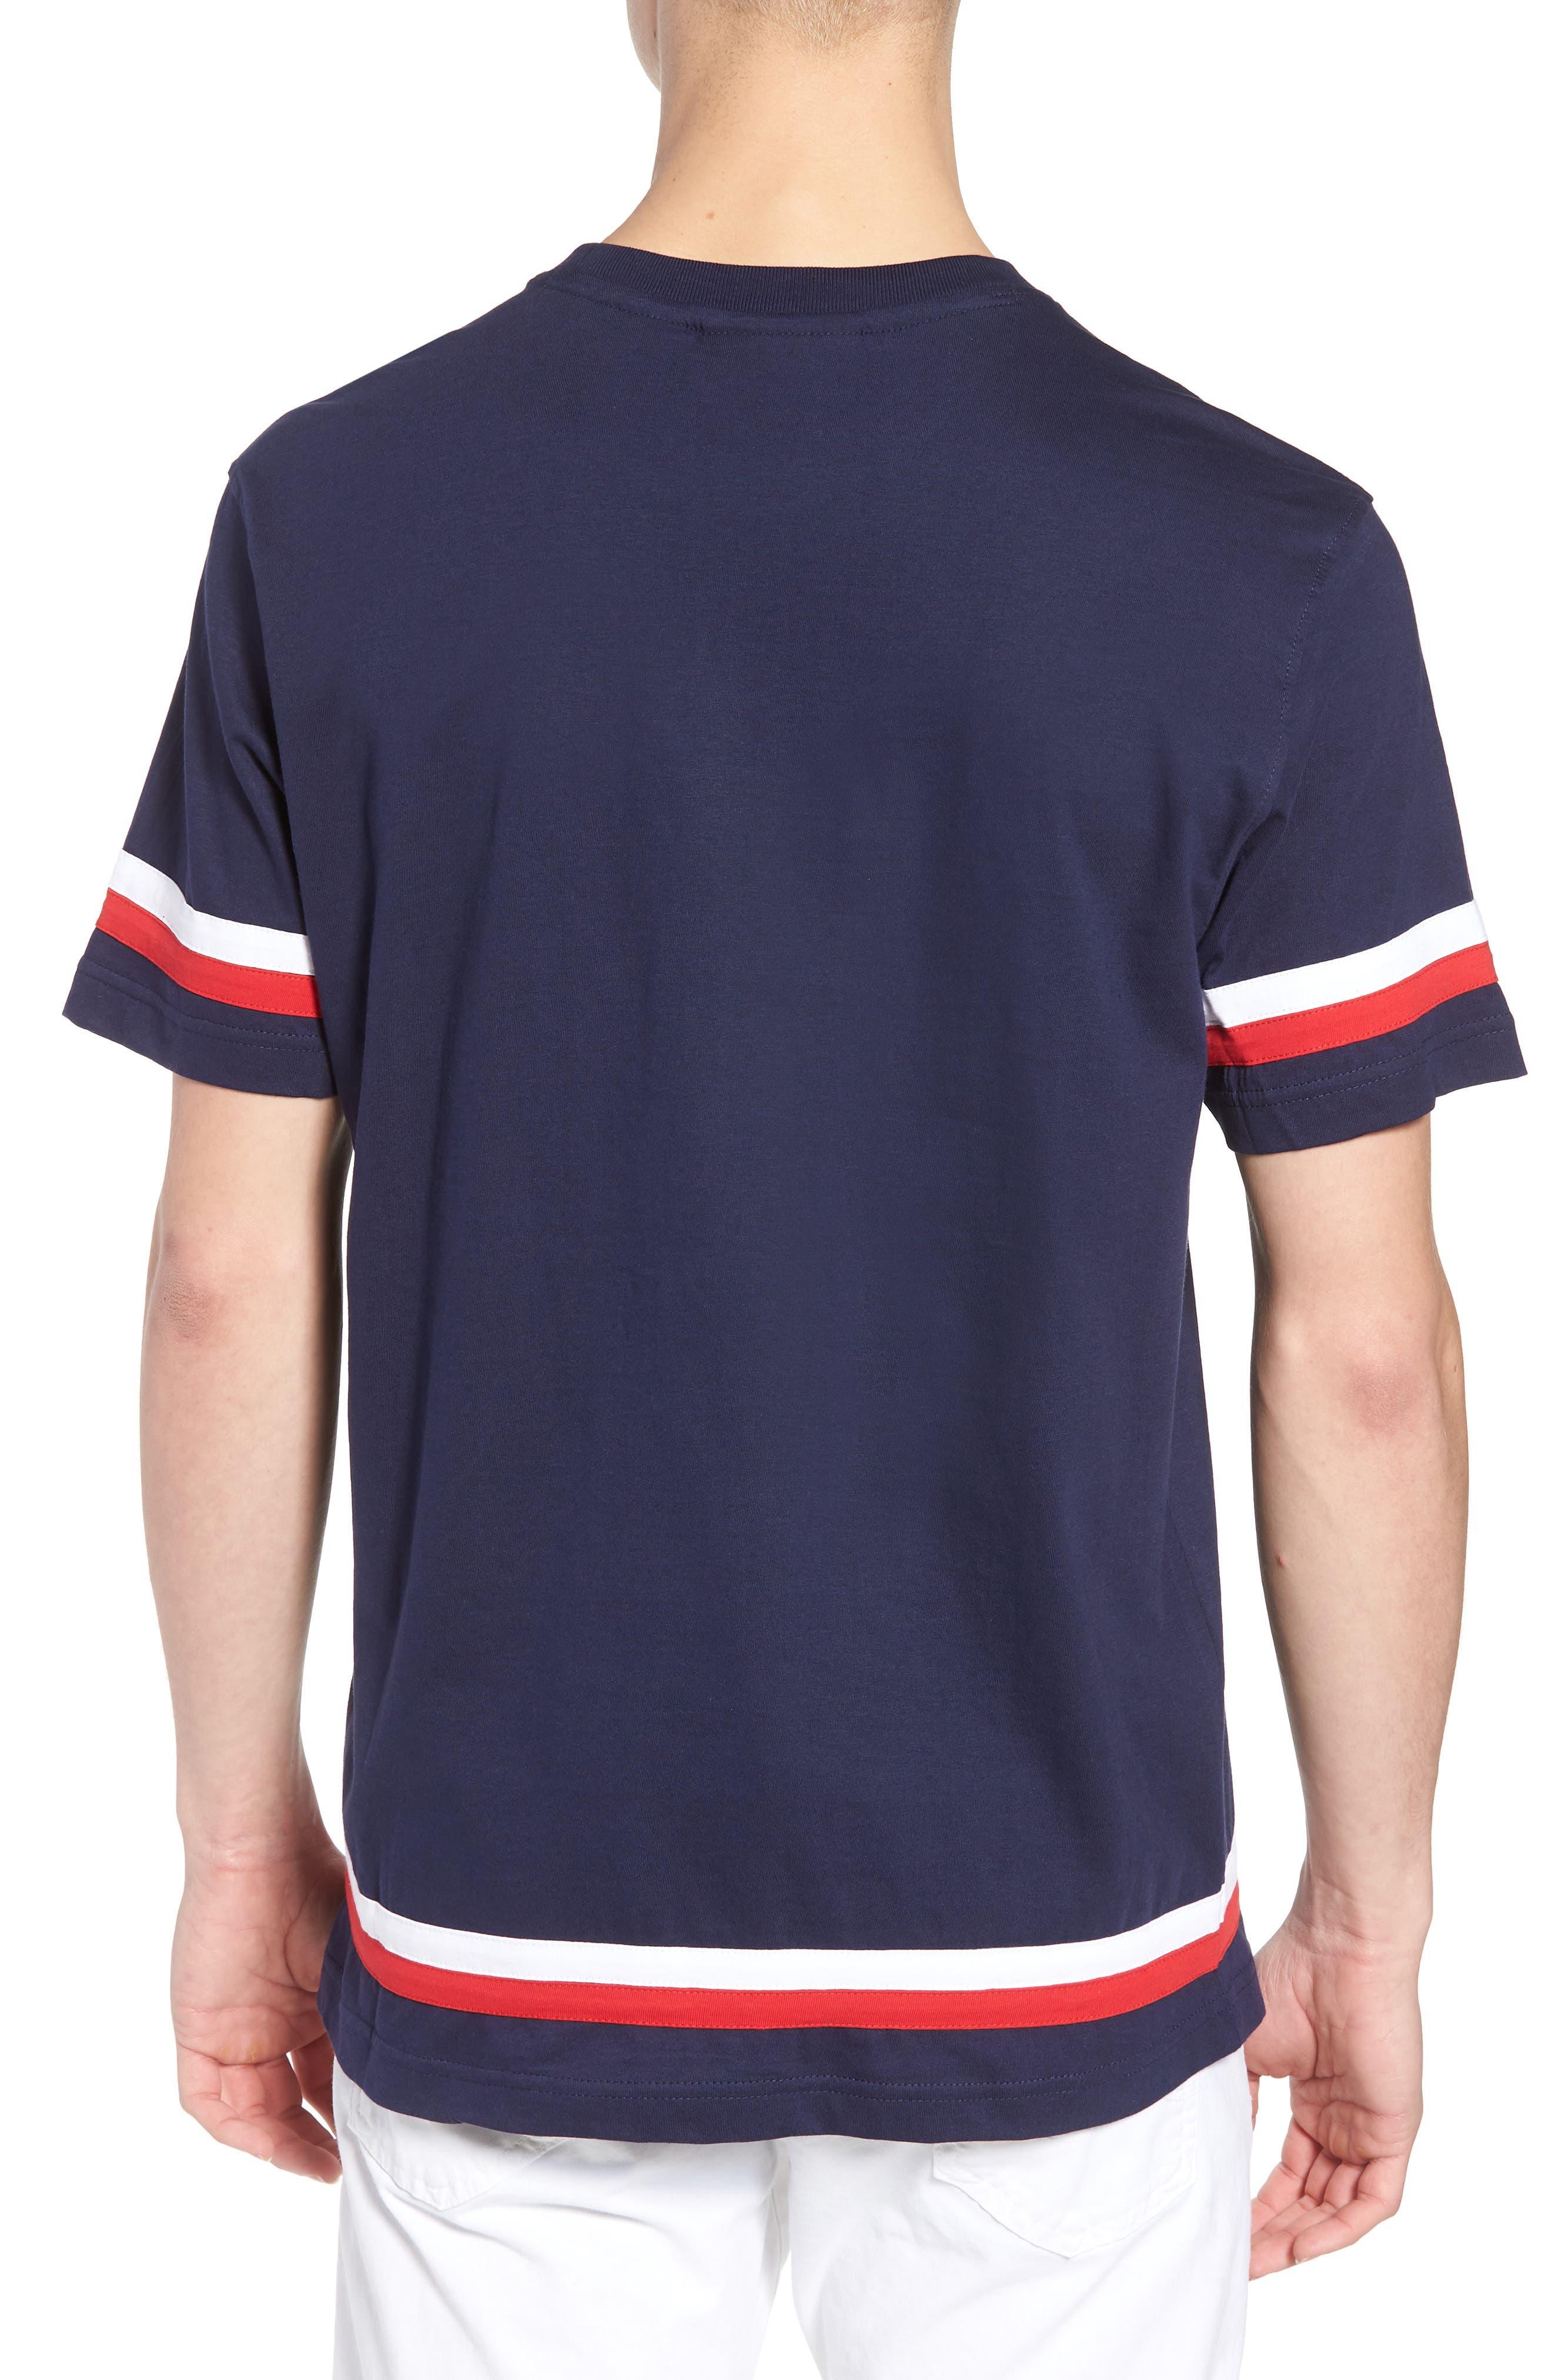 Riley T-Shirt,                             Alternate thumbnail 2, color,                             410